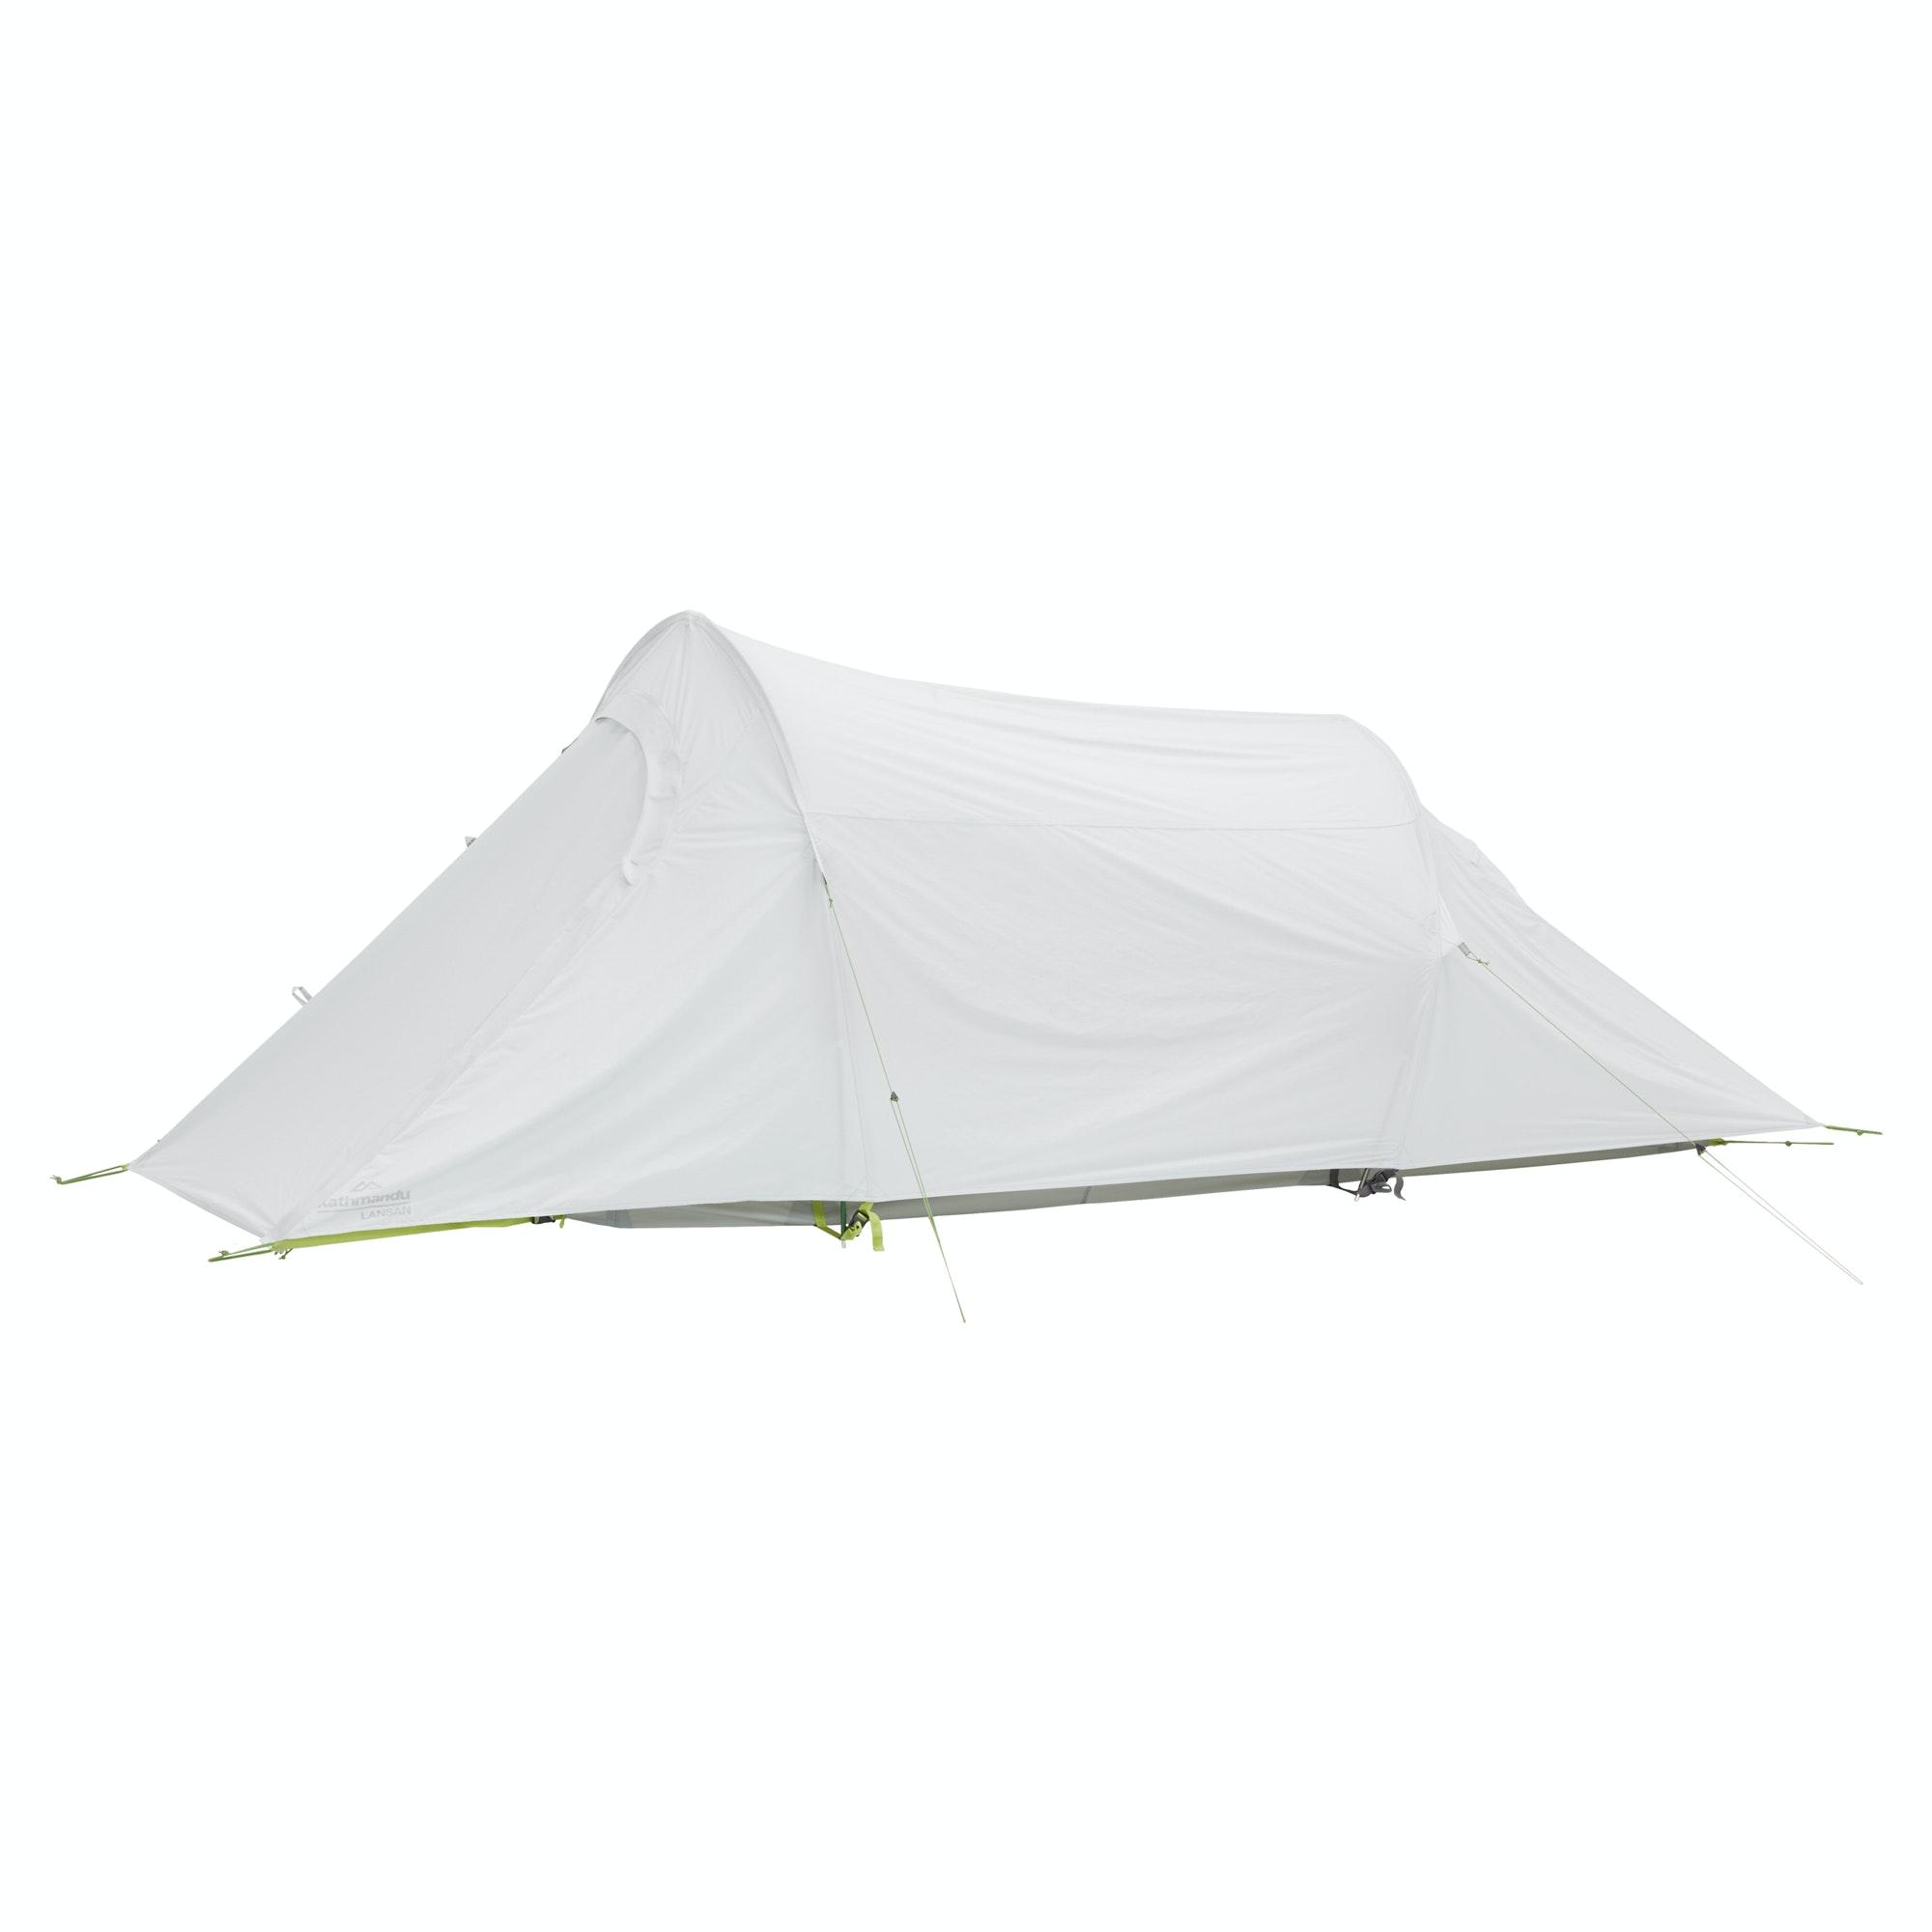 sc 1 st  Kathmandu & Lansan Ultralight Tent